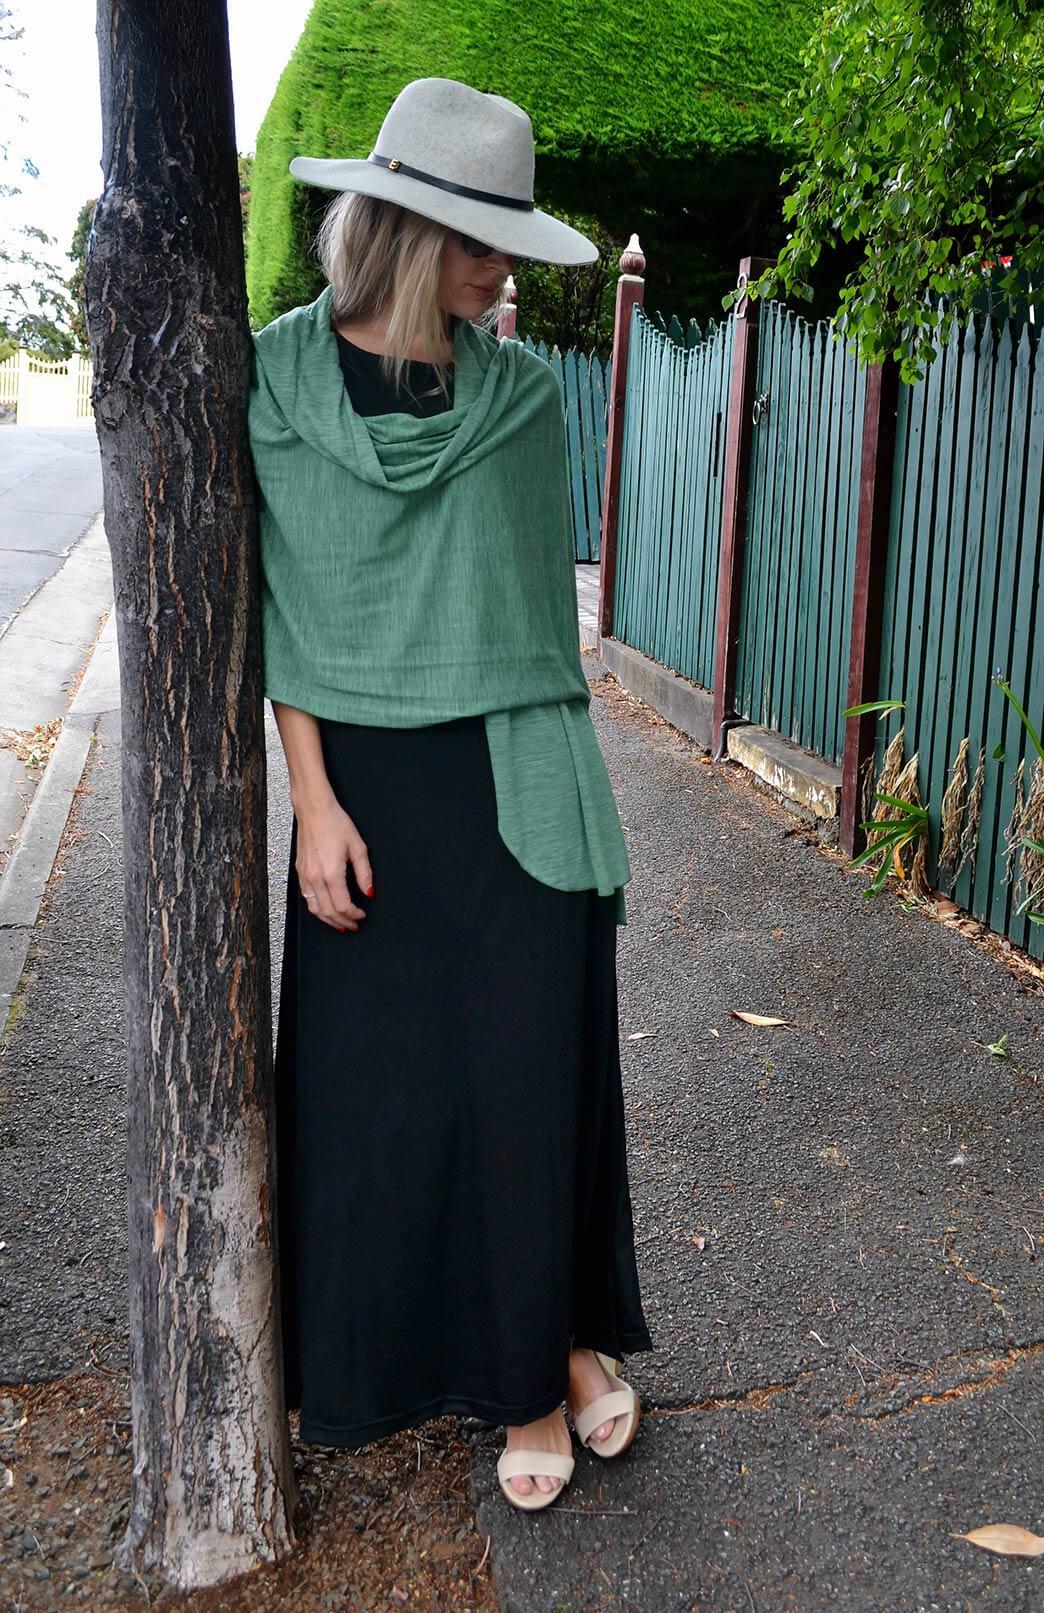 cd494428d3825 Scarves - Lightweight - Women s Superfine Merino Wool   Modal Blend Classic  Wide Scarf - Smitten